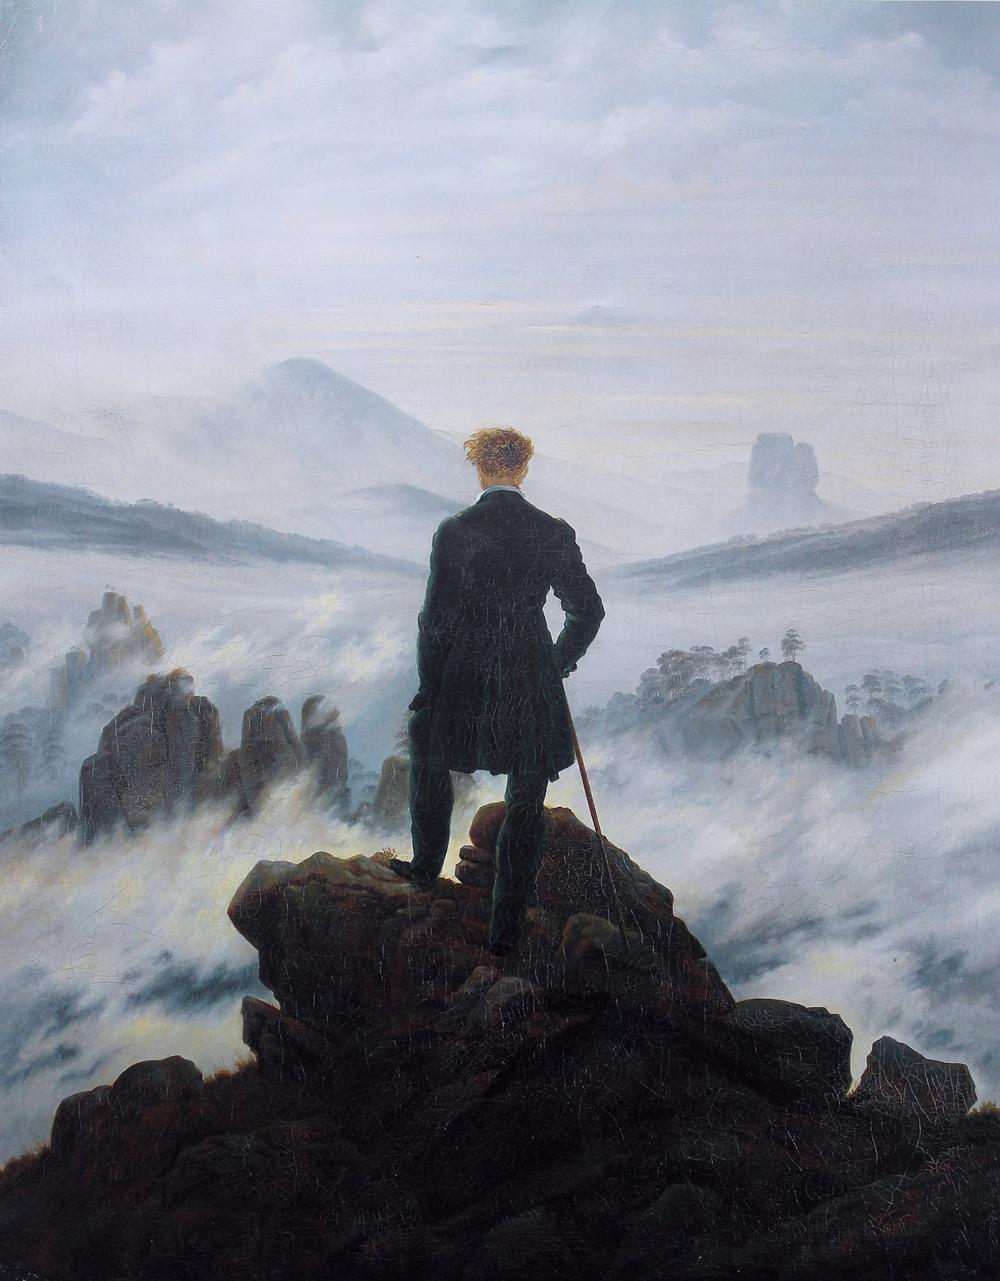 15_Caspar-David-Friedrich_Wanderer-Above-the-Sea-of-Fog_webpg-pre-sneak.jpg